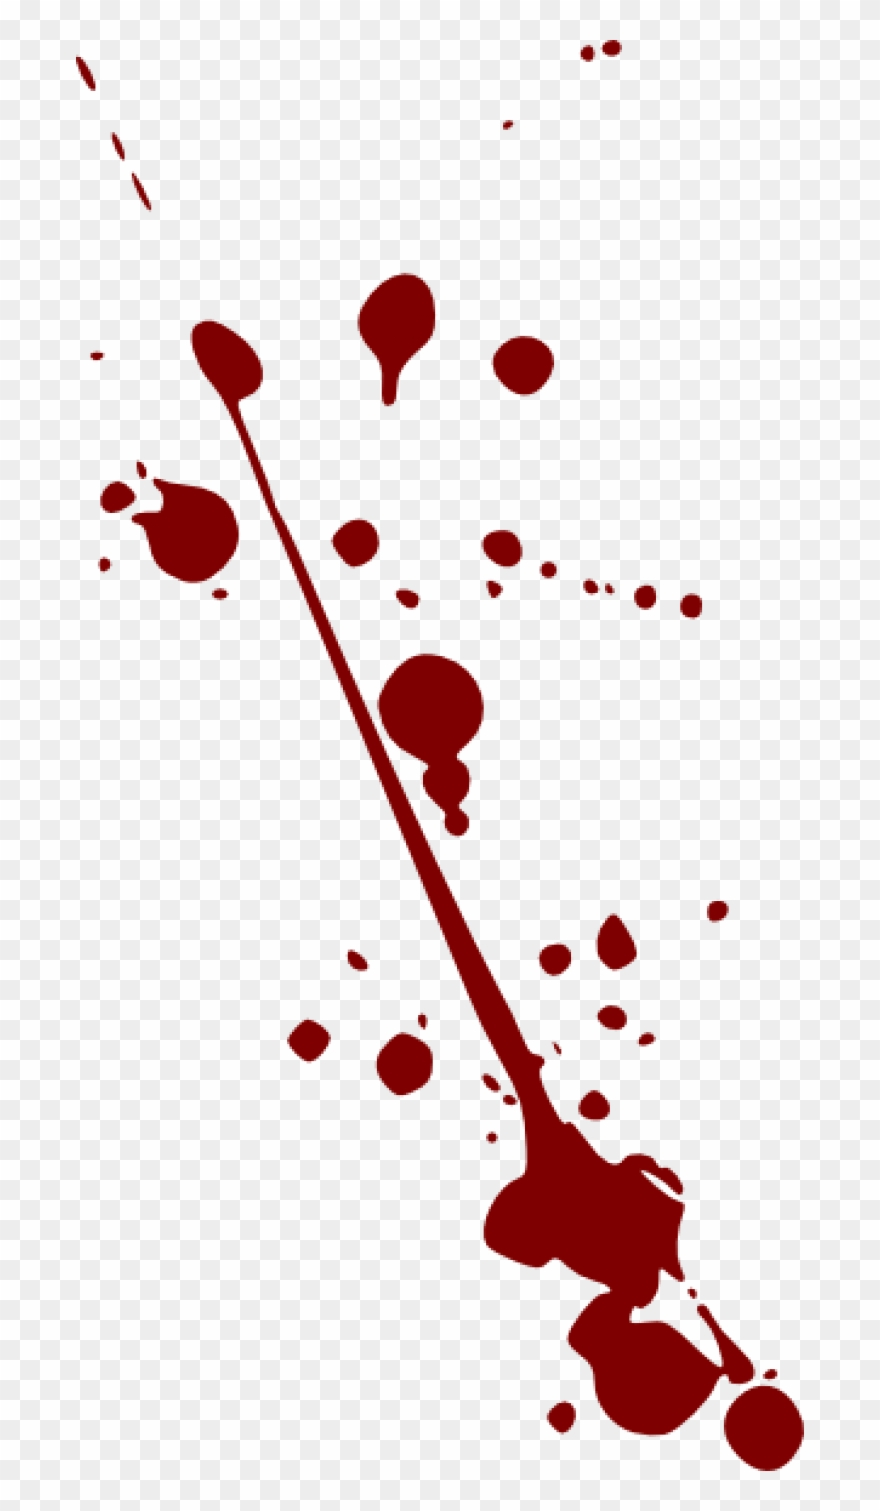 hight resolution of blood splatter clipart blood splatter clip art at clker blood splatter gif transparent png